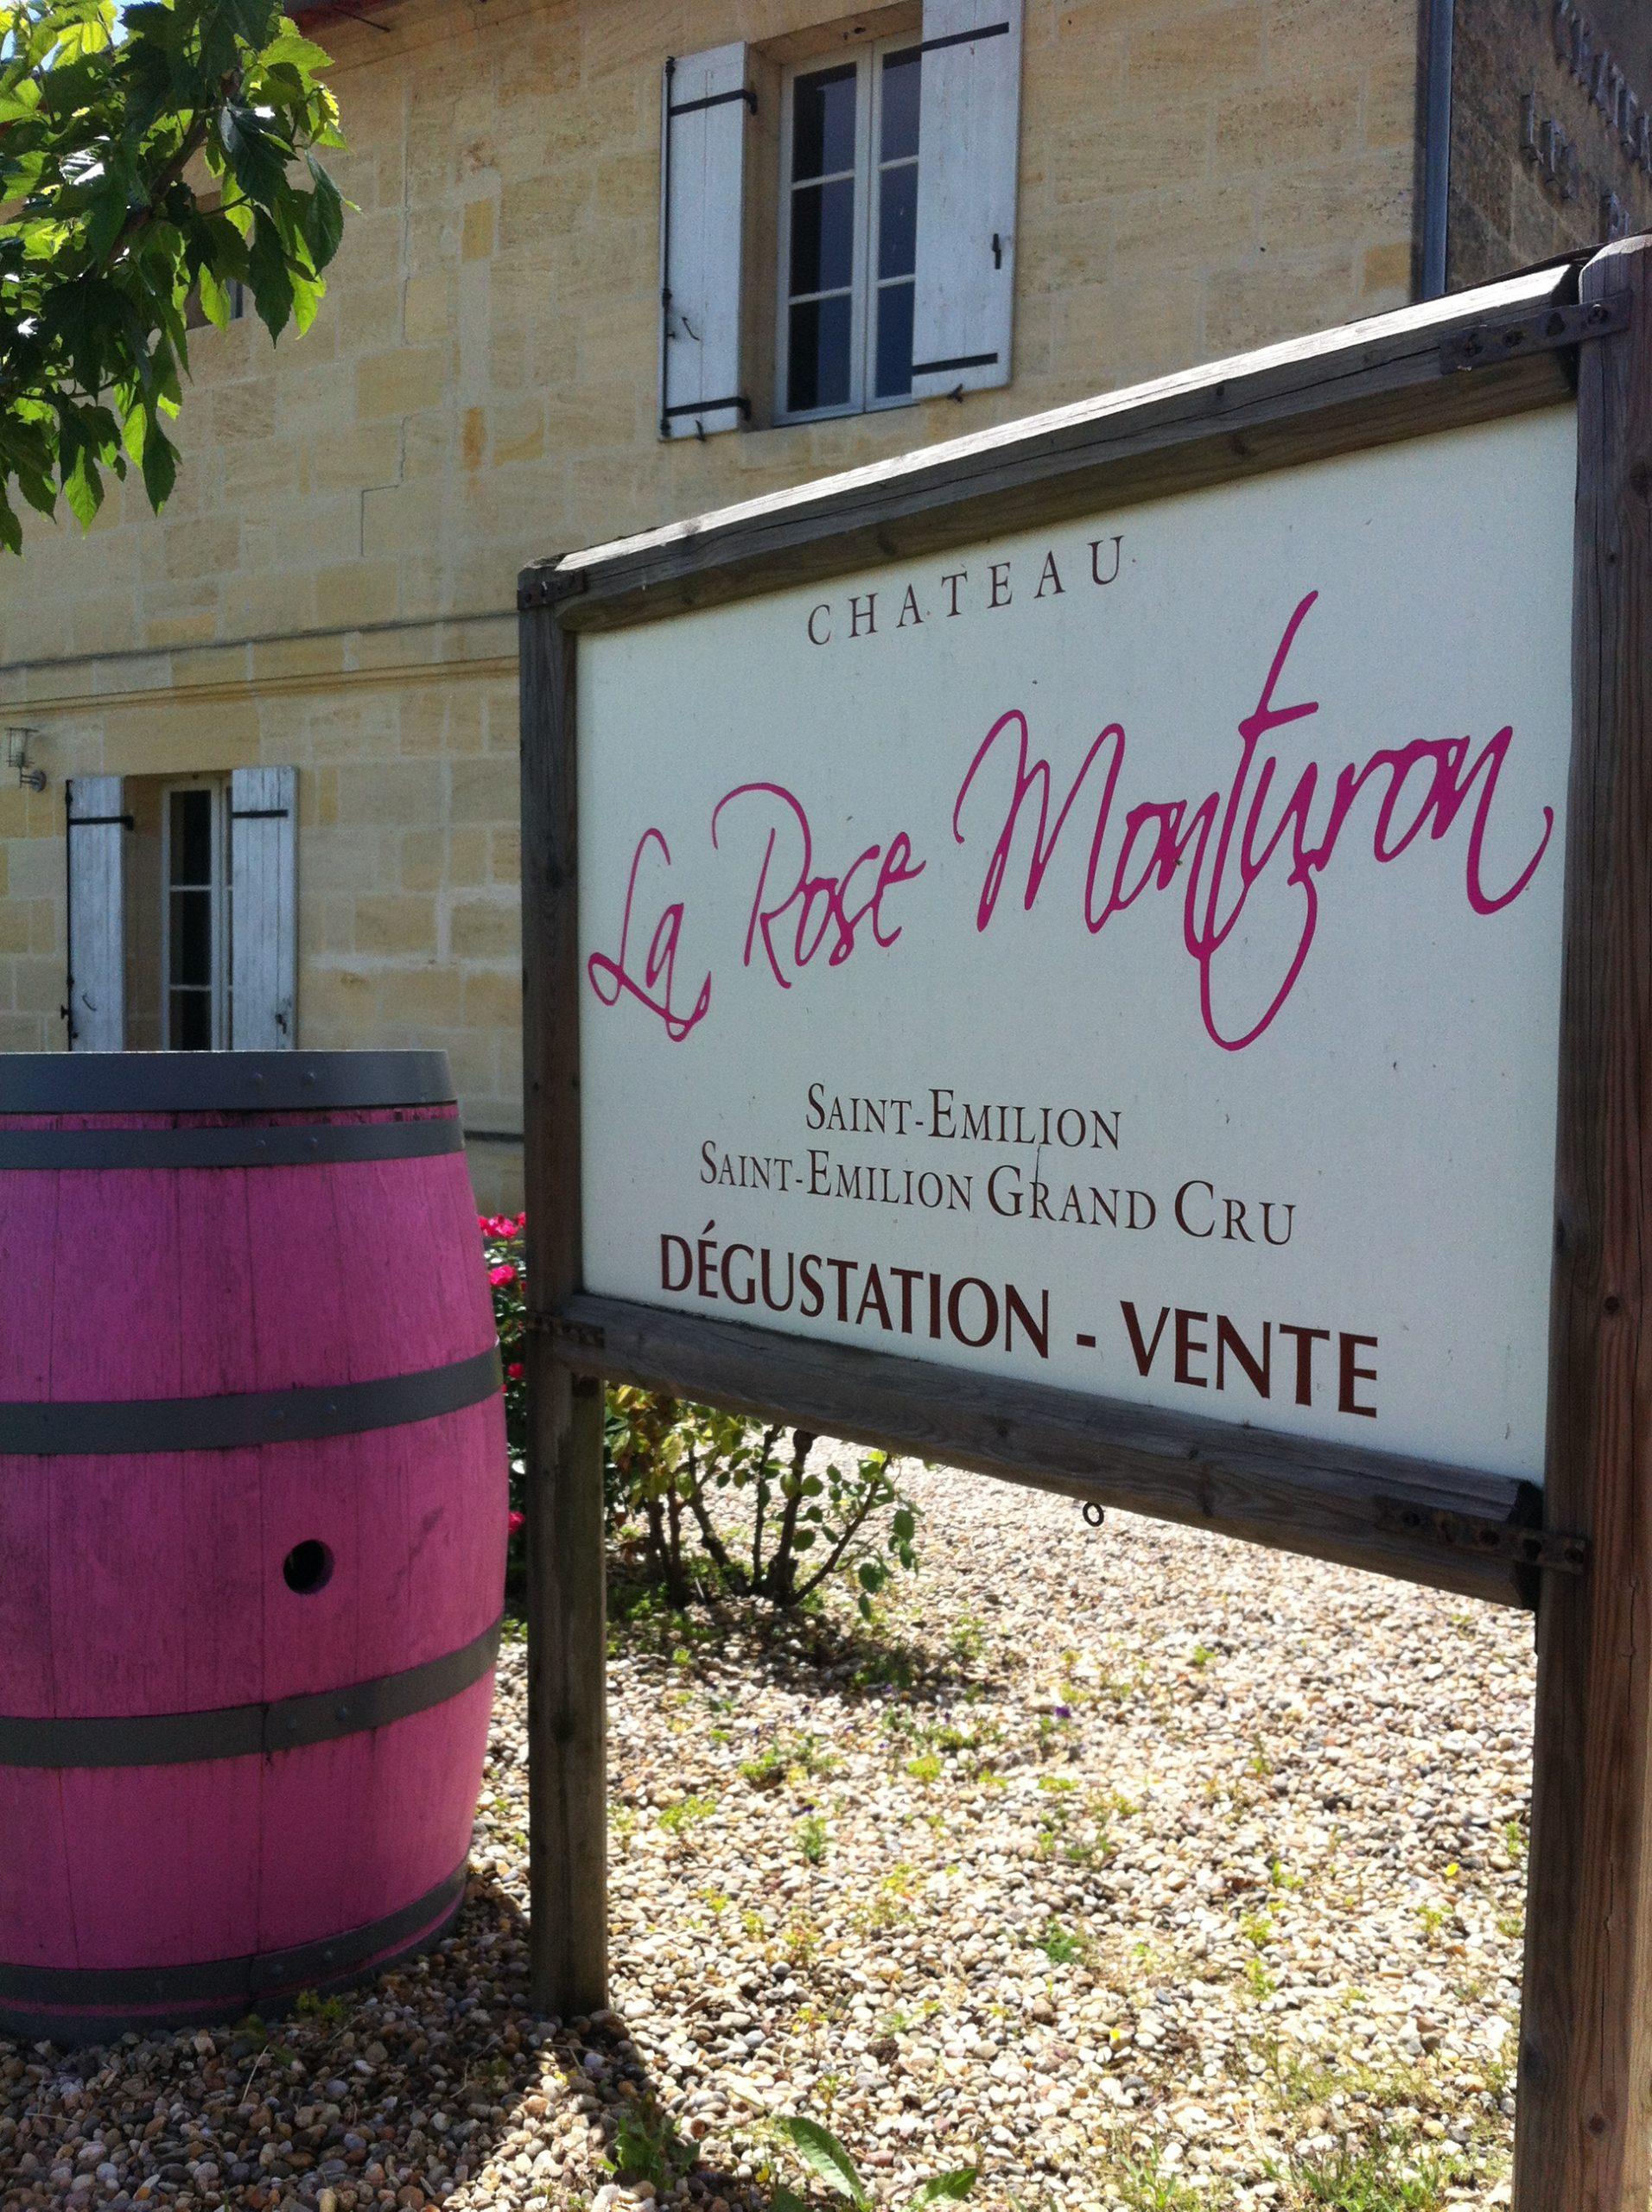 viticulteur.Myriam.Dubes_photo1 (15)